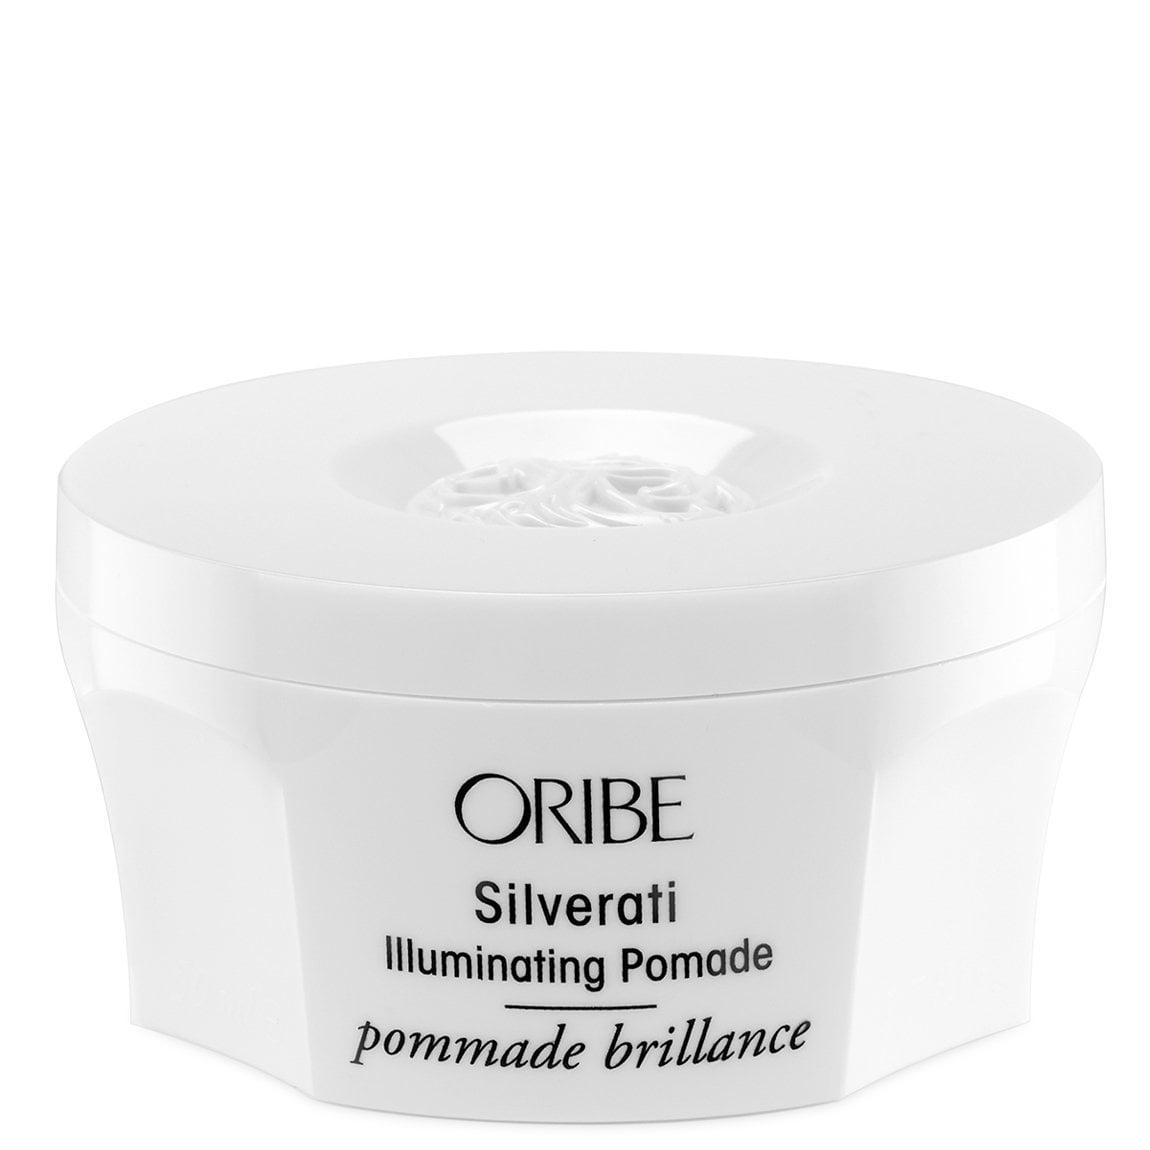 oribe silverati illuminating pomade